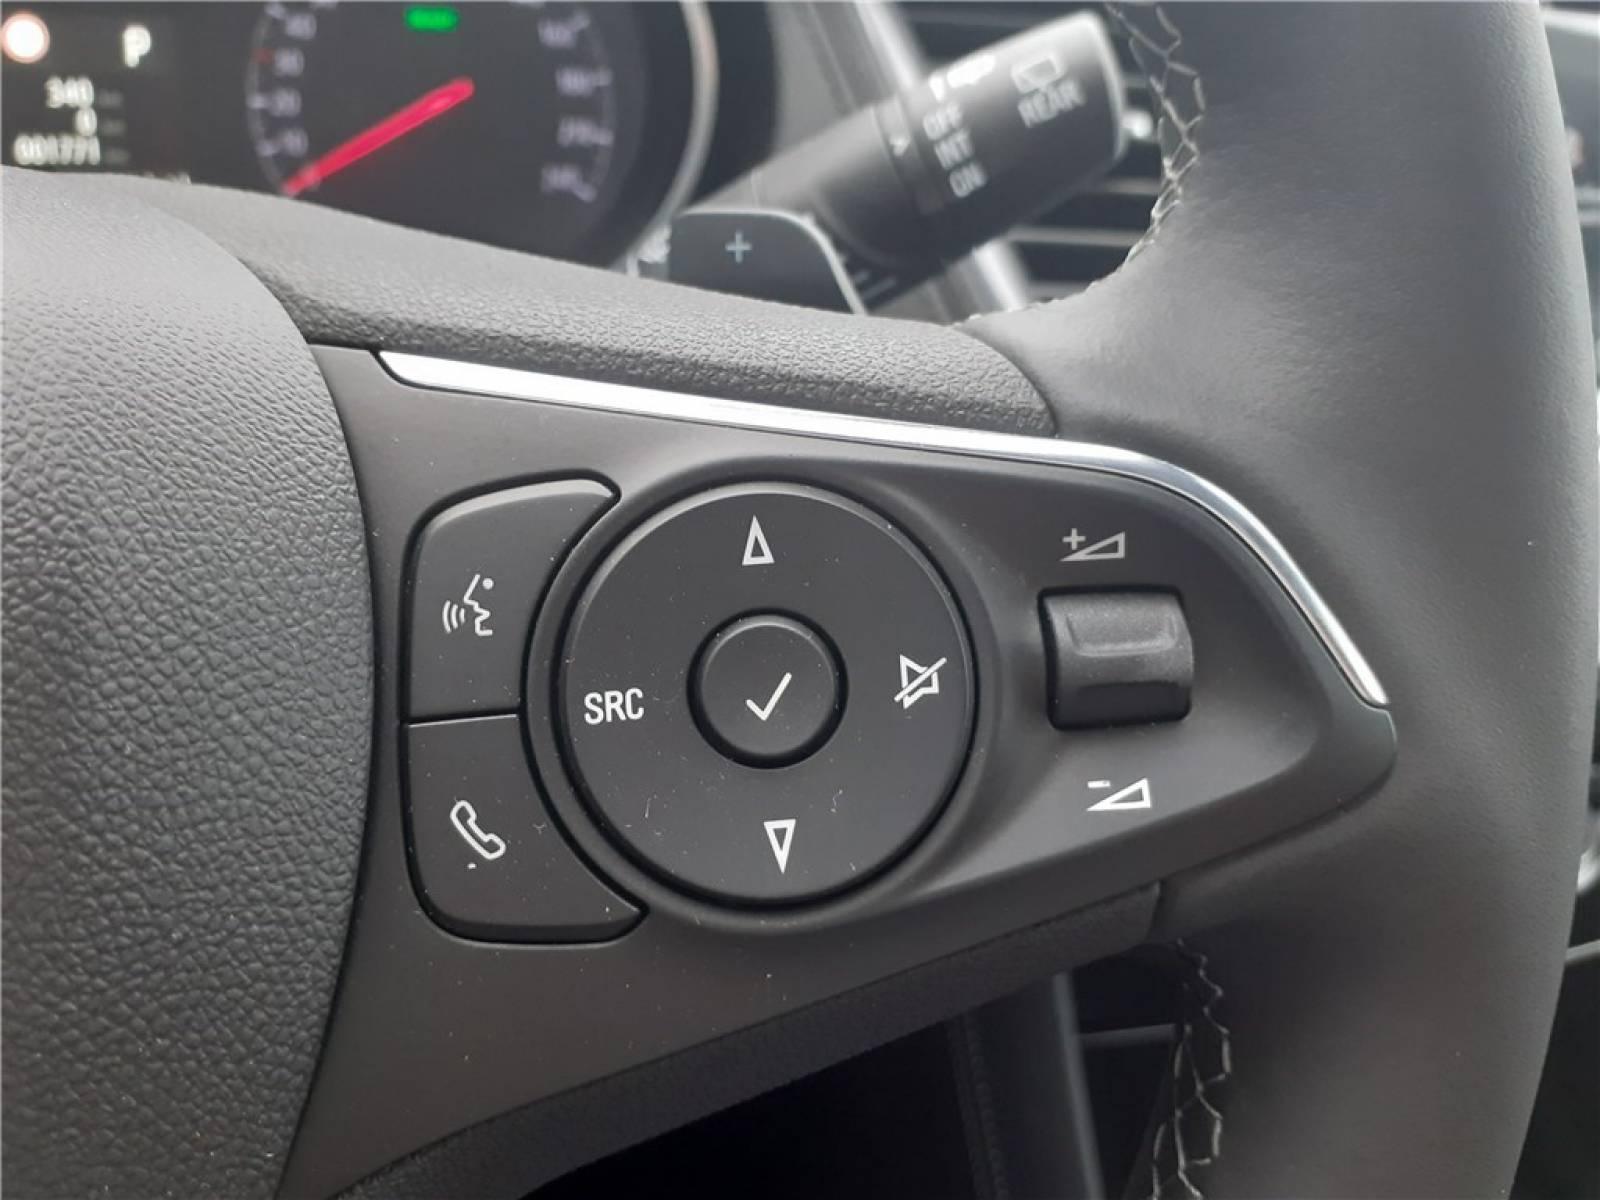 OPEL Grandland X Hybrid 225 ch BVA8 - véhicule d'occasion - Groupe Guillet - Opel Magicauto - Chalon-sur-Saône - 71380 - Saint-Marcel - 42